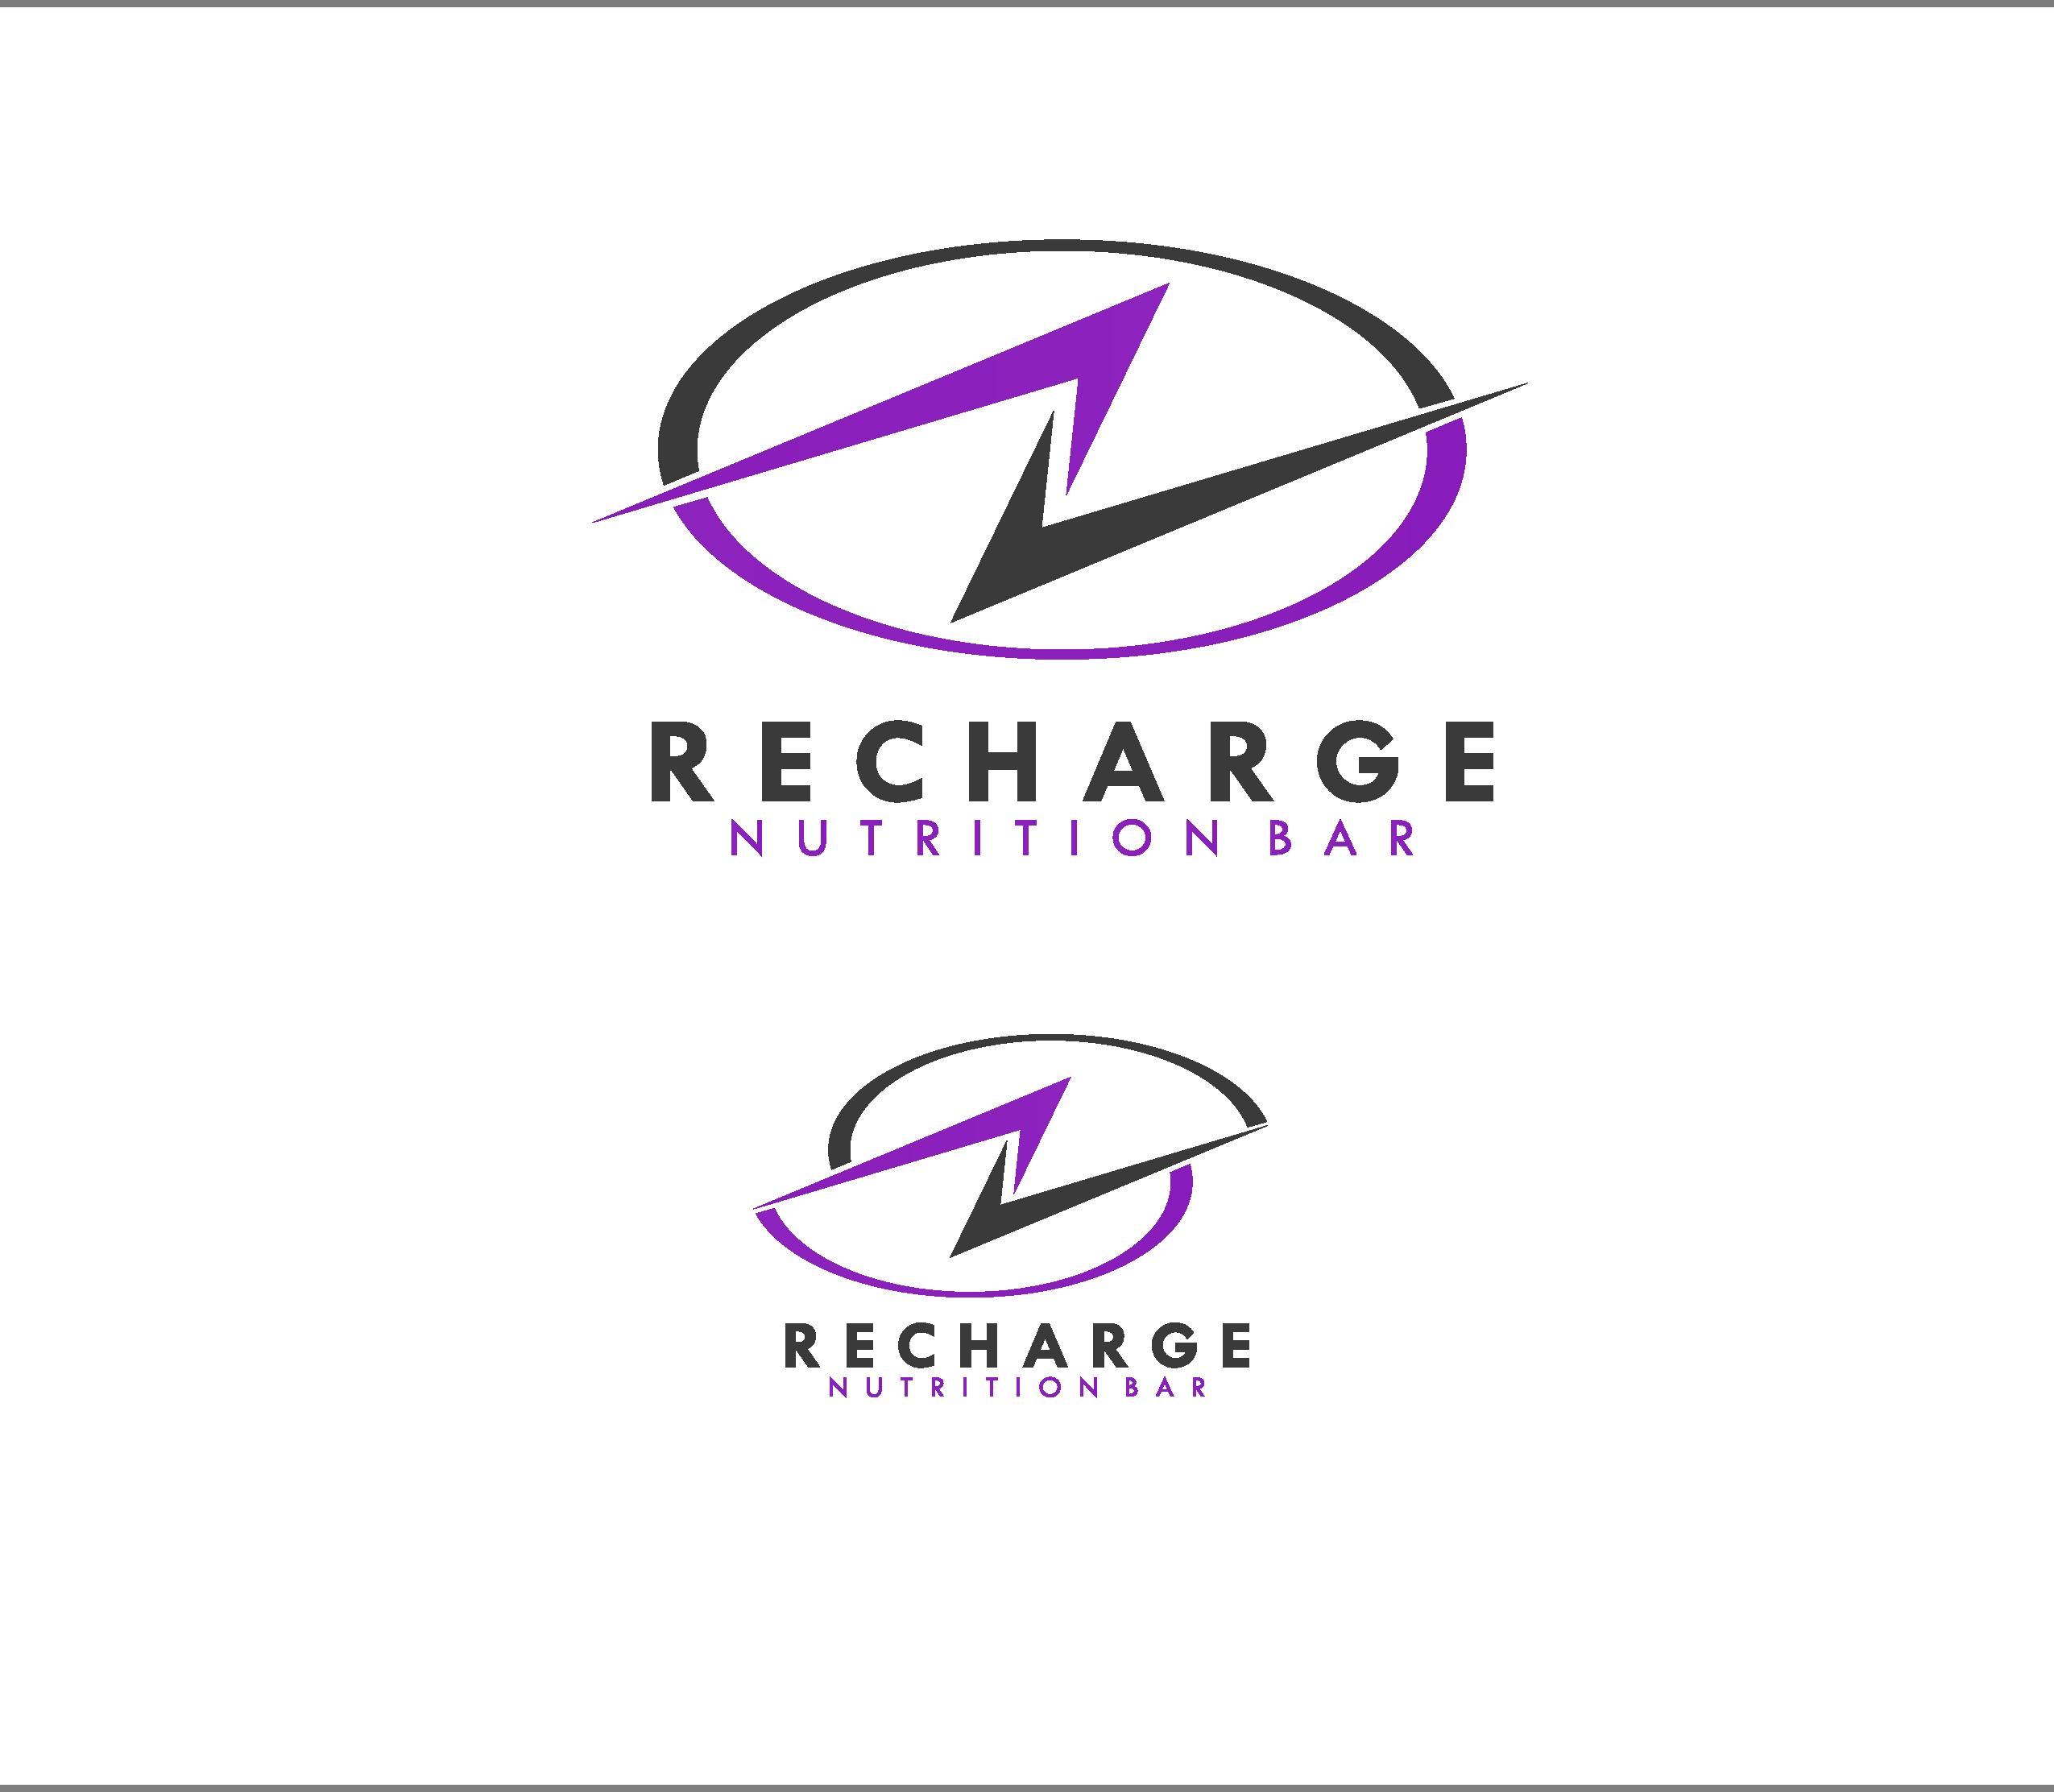 Logo Design by Allan Esclamado - Entry No. 61 in the Logo Design Contest Artistic Logo Design for Recharge Nutrition Bar Inc.